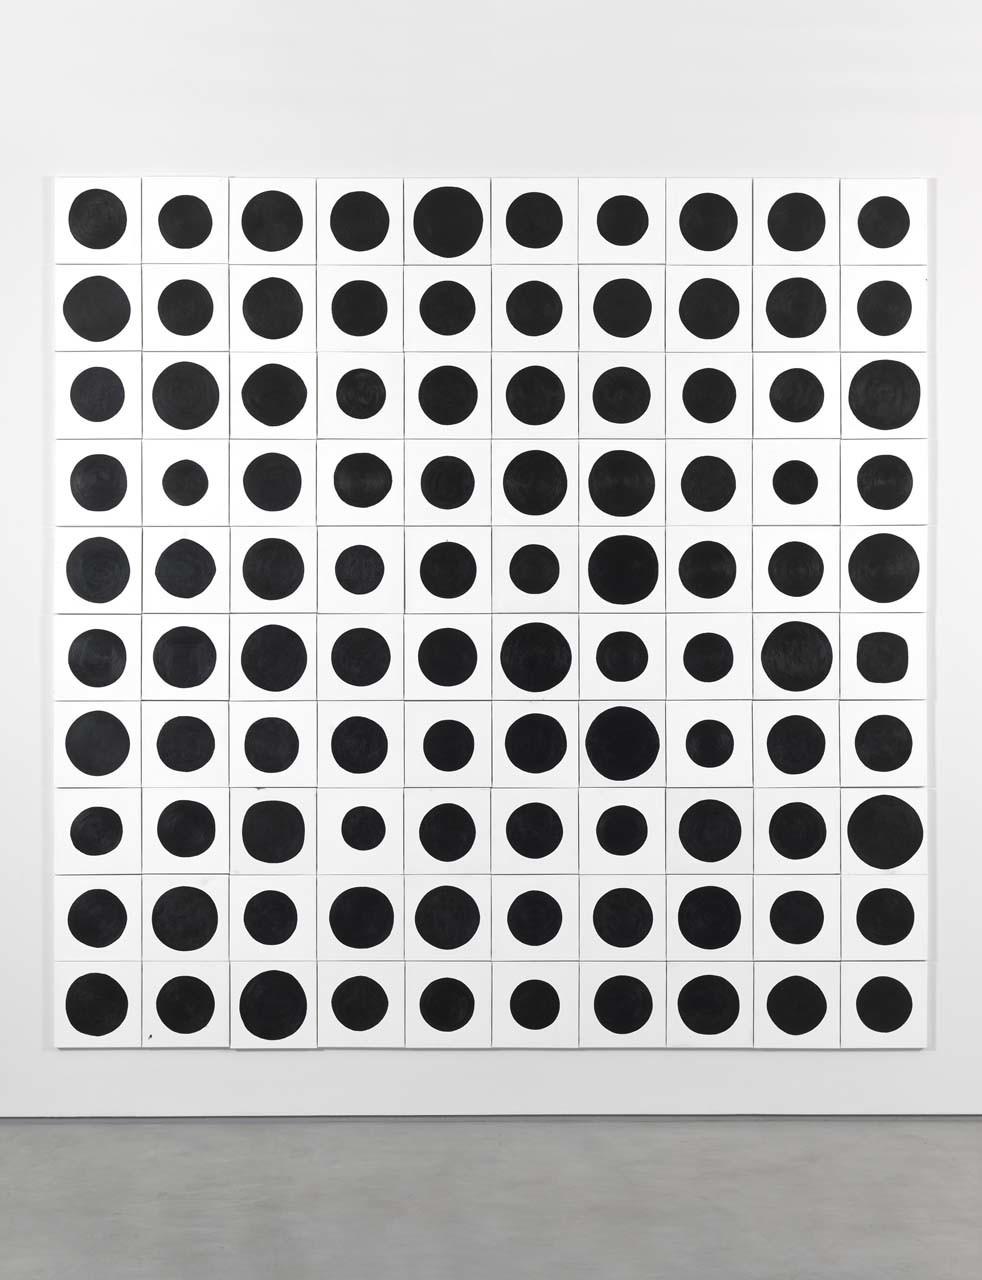 "<div class=""artwork_caption""><p>100 Dots, 2015</p></div>"